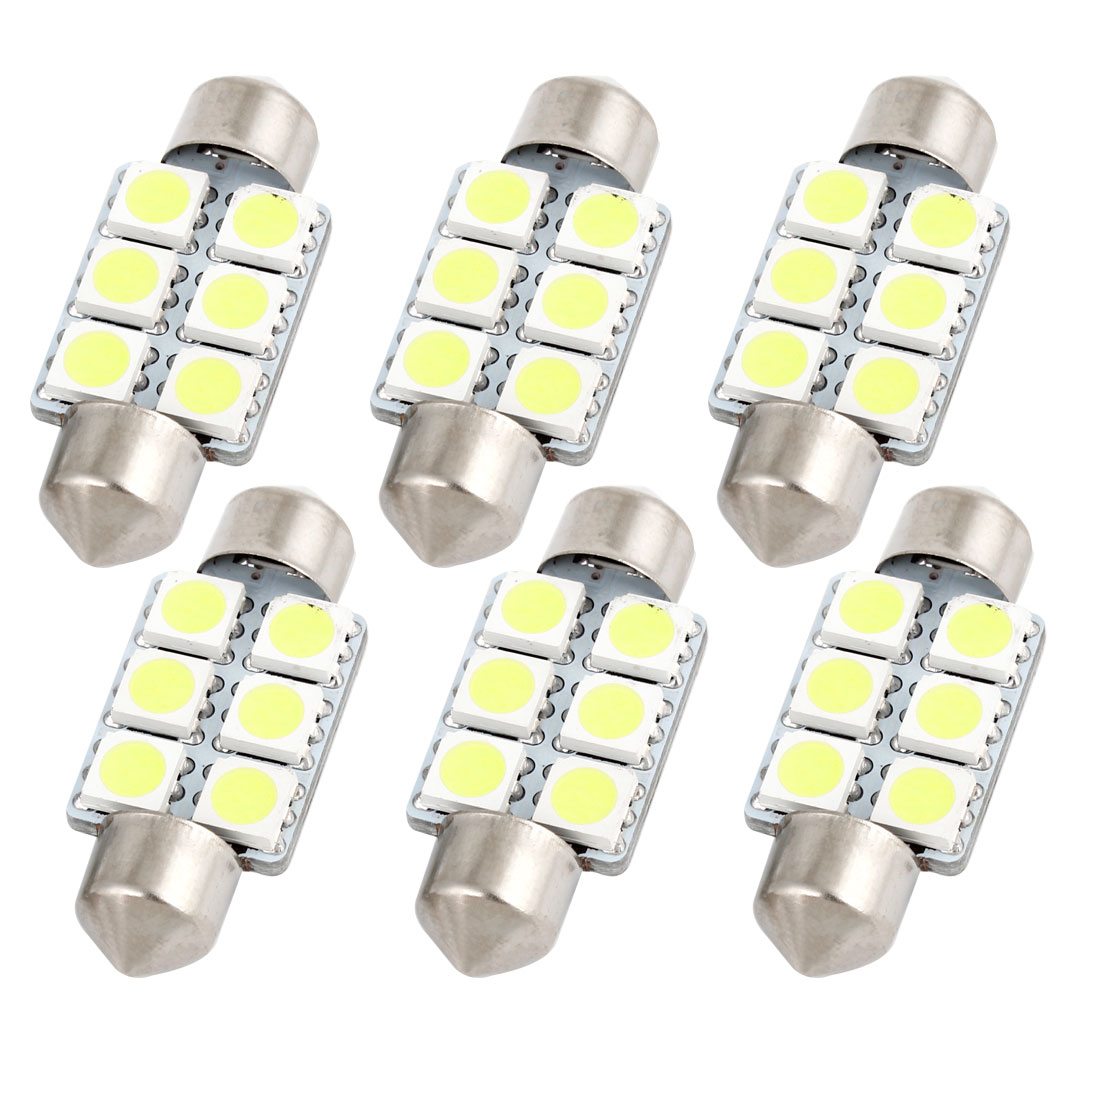 6 X White 36MM 5050 6SMD Festoon Dome Map Interior LED Light bulbs DE3423 6418